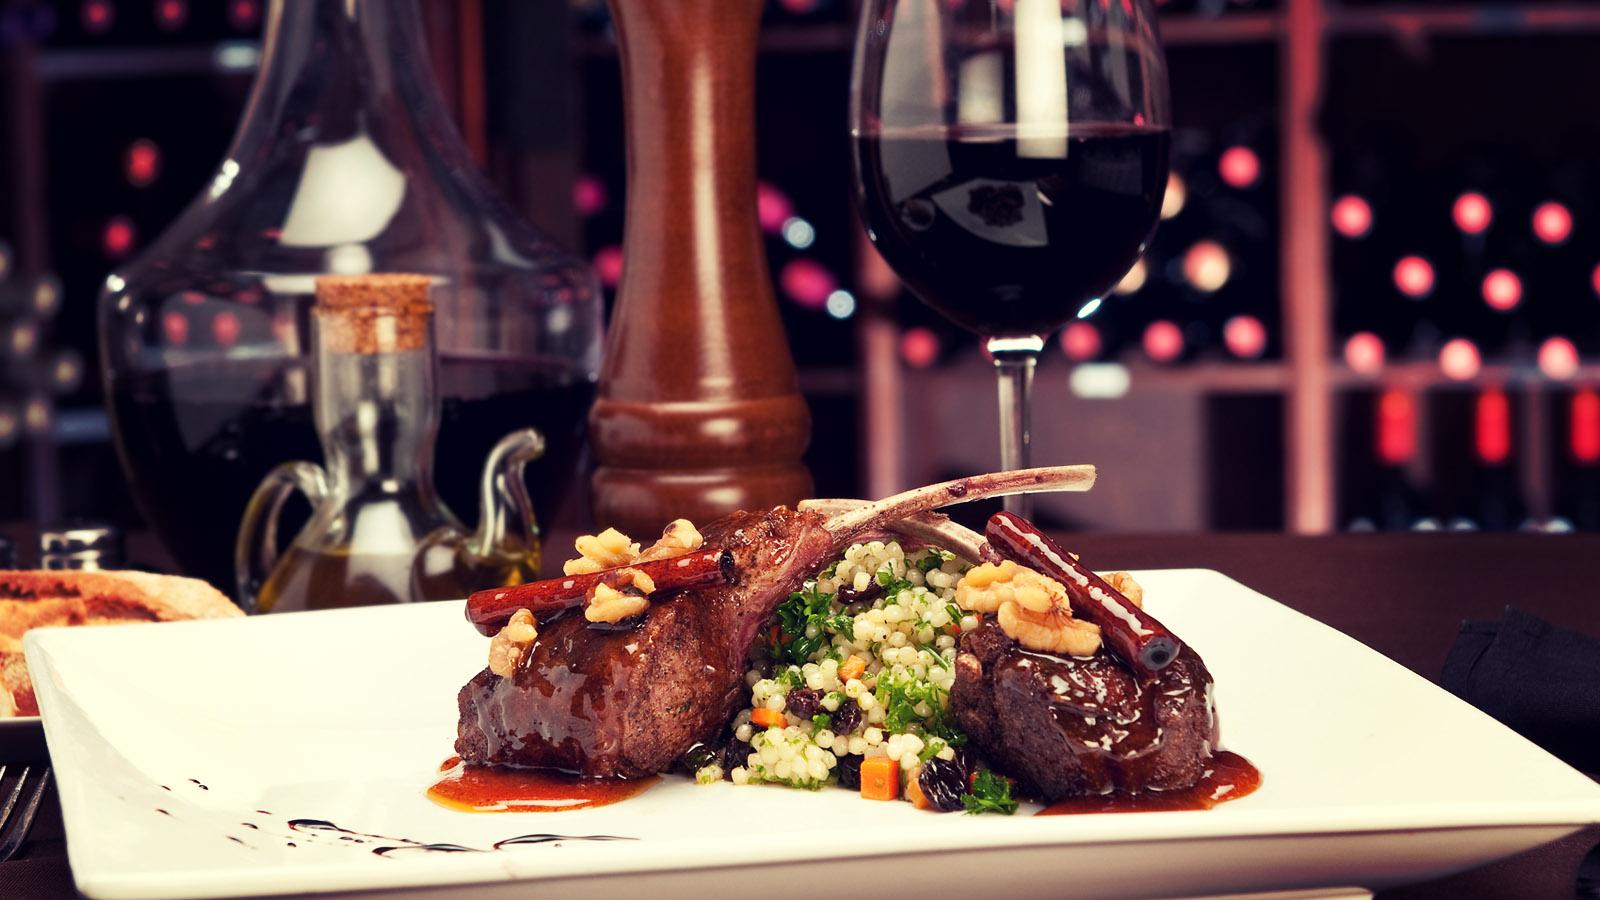 il-castello-berlin-buch-restaurant-eventlocation-pension-sllider14